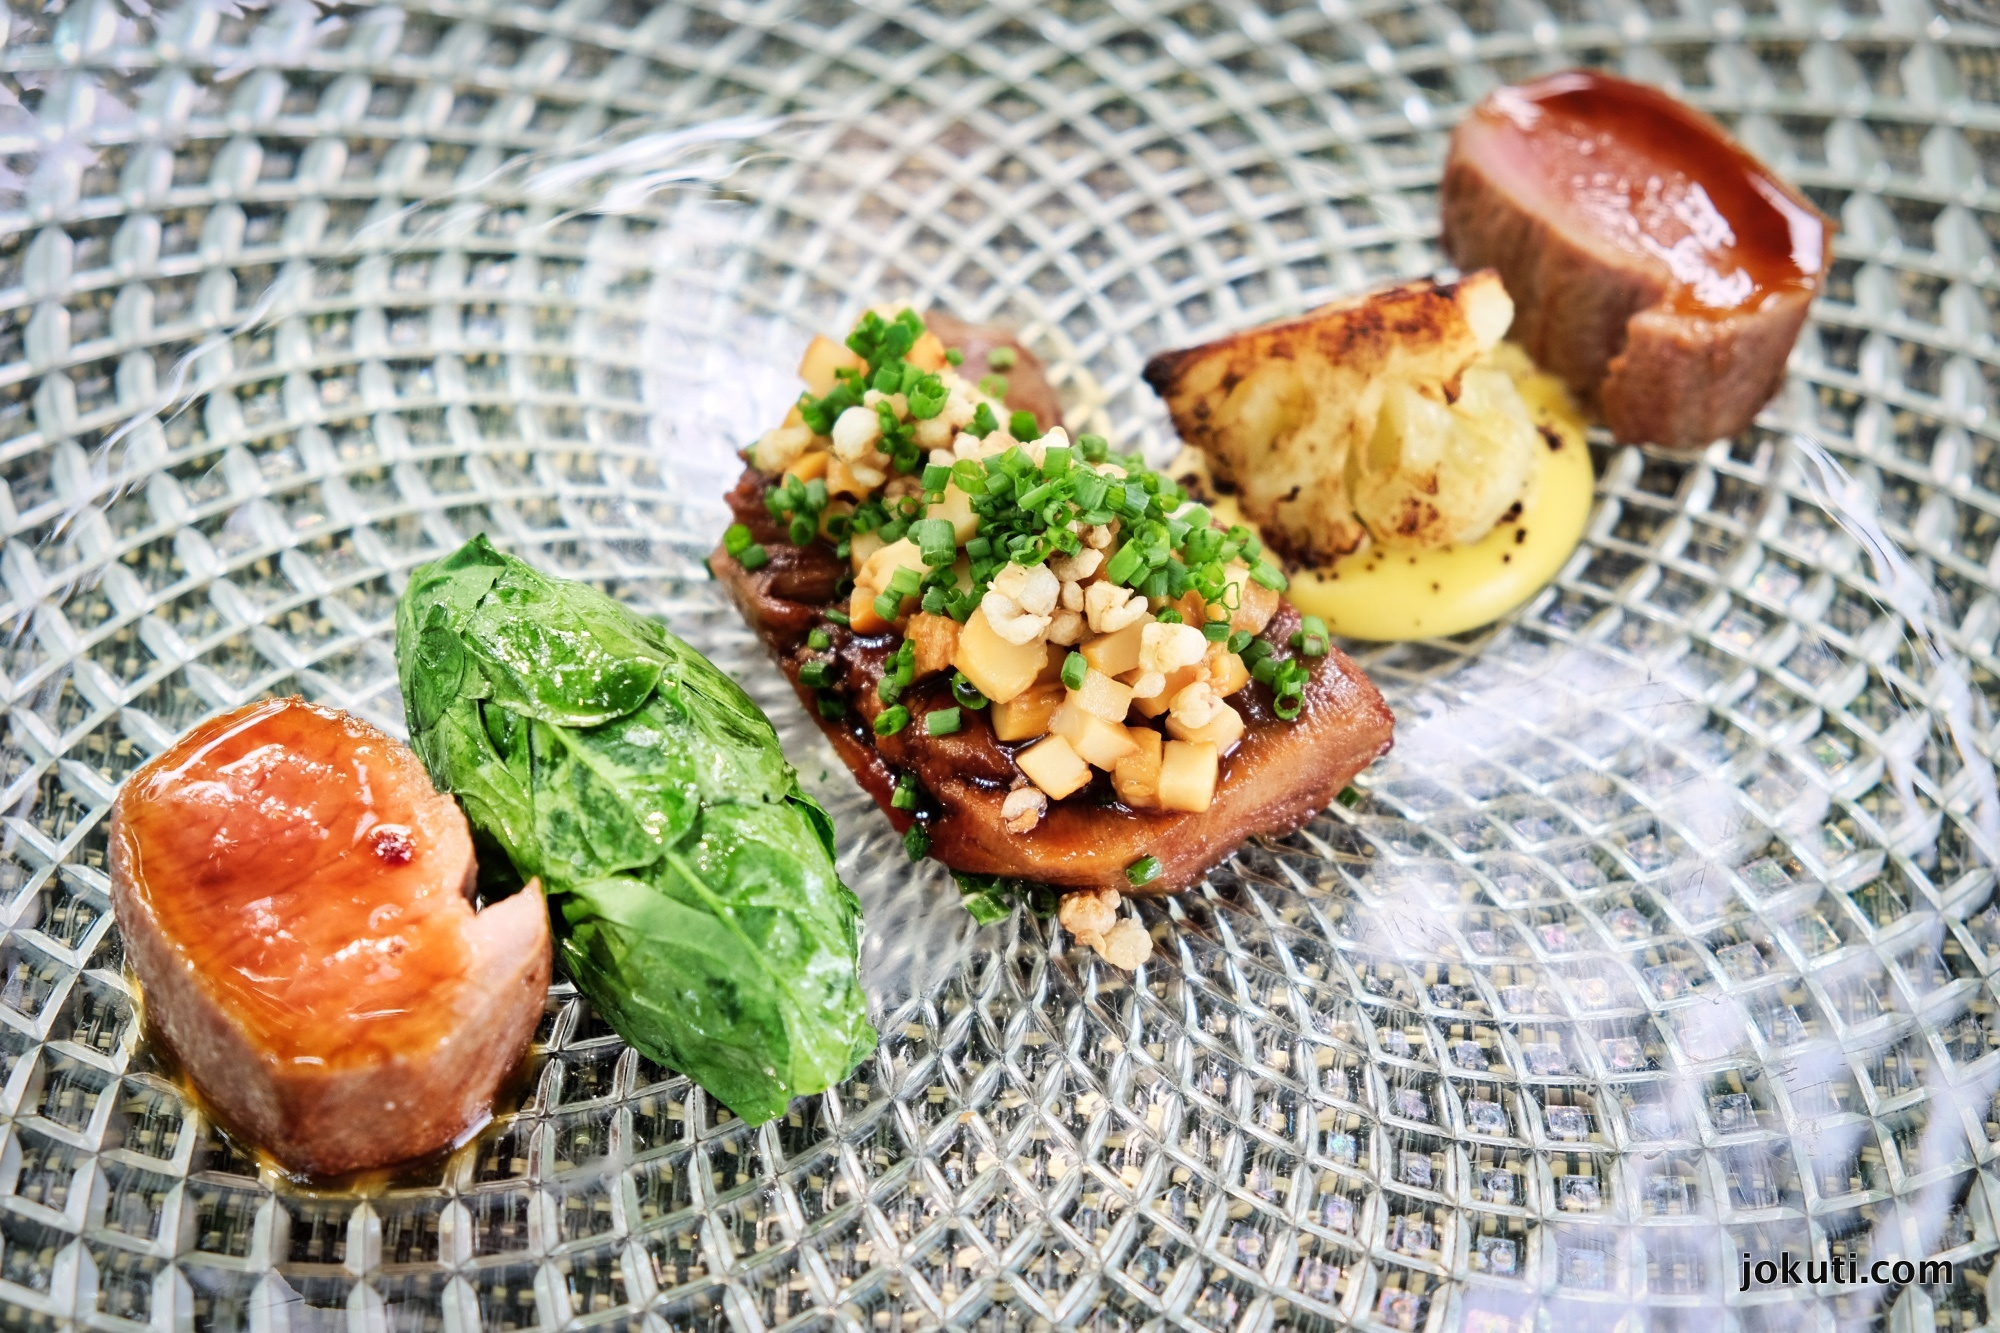 dscf6953_platan_tata_pesti_restaurant_denmark_vilagevo_jokuti_andras_l_l.jpg